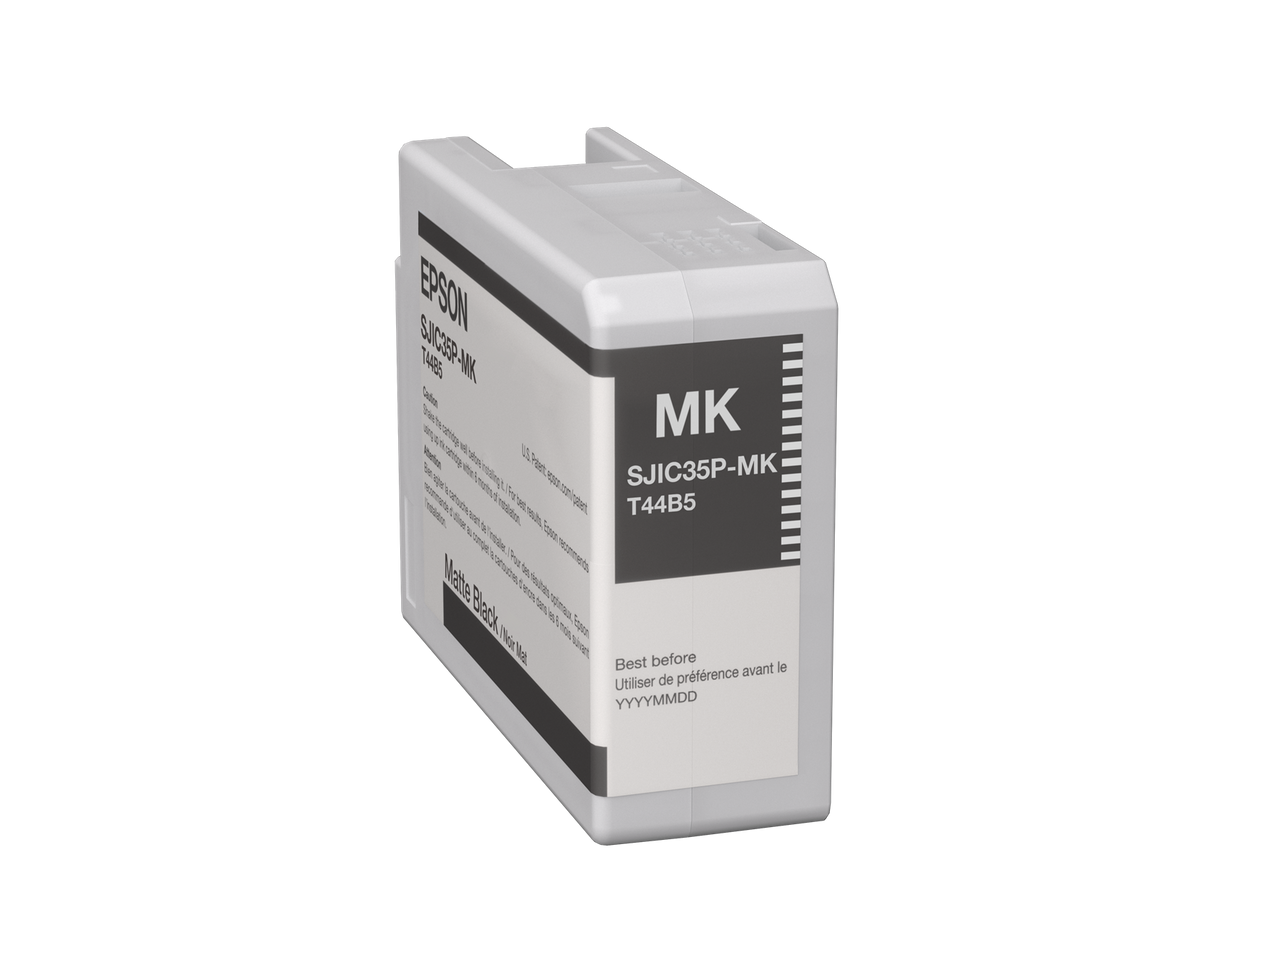 Epson ColorWorks C6000/C6500 SJIC35P(MK) Black Matte Ink Cartridge | C13T44B520